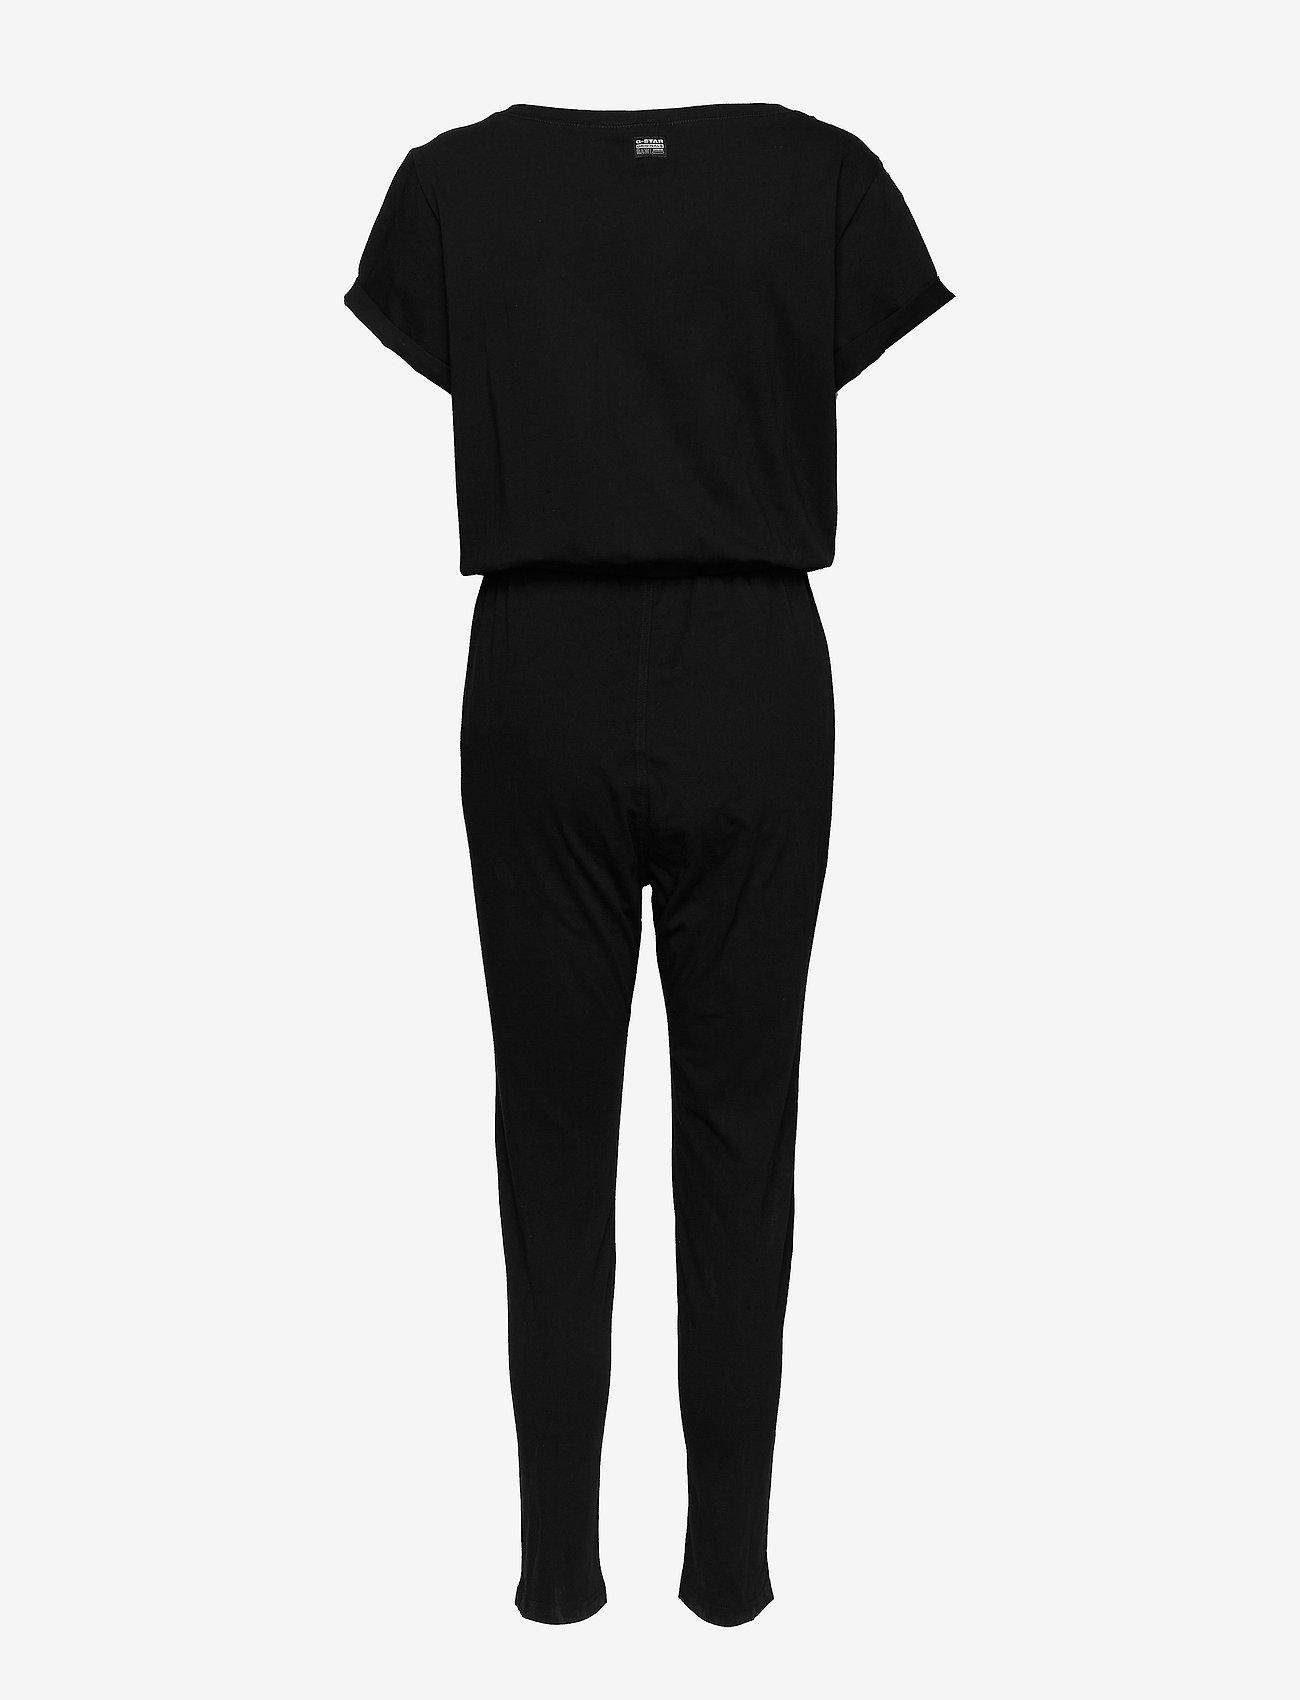 G-star RAW - Cocaux r suit wmn s\s - buksedragter - dk black - 1